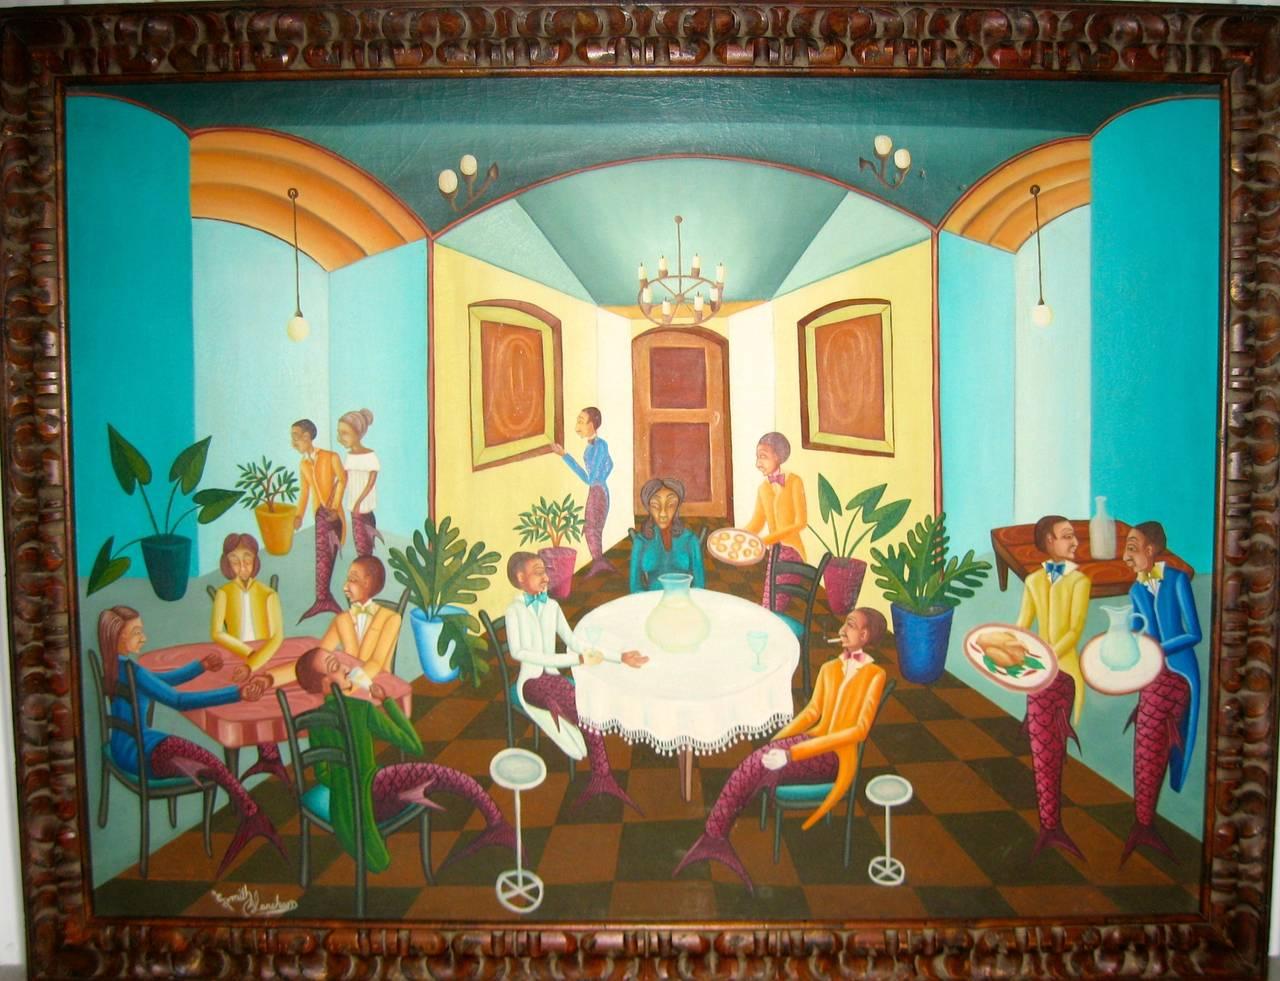 Surrealist Restaurant Scene with Mermades and Mermen 1